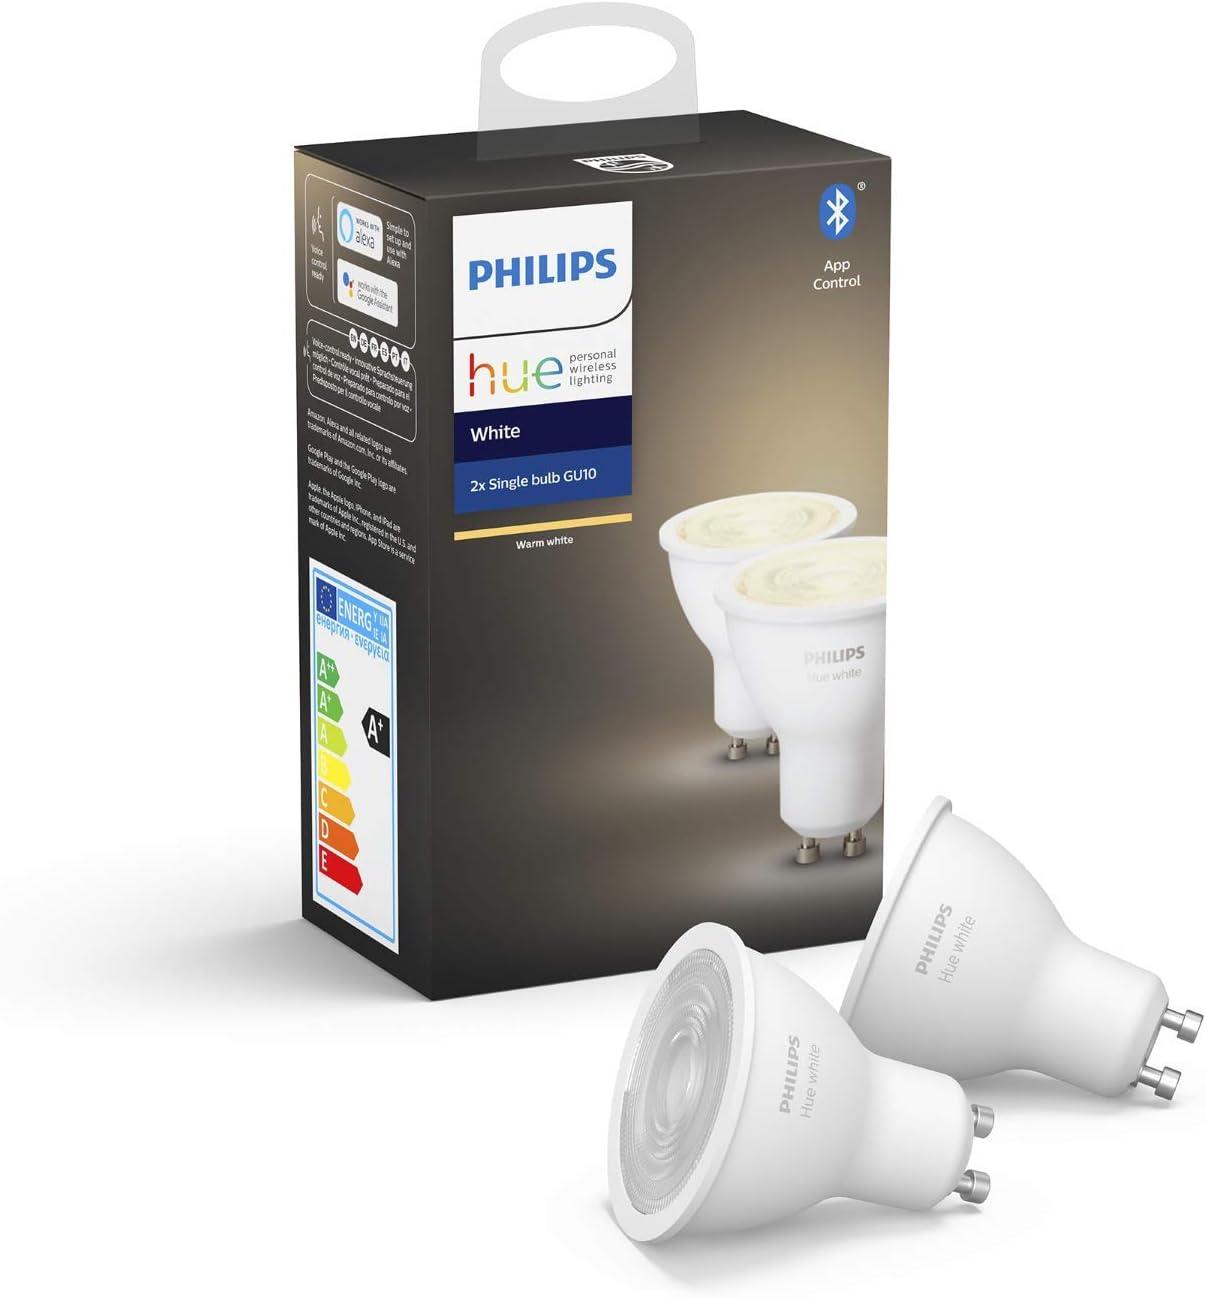 Philips Hue White GU10 LED Lampe Doppelpack - GU10 LED